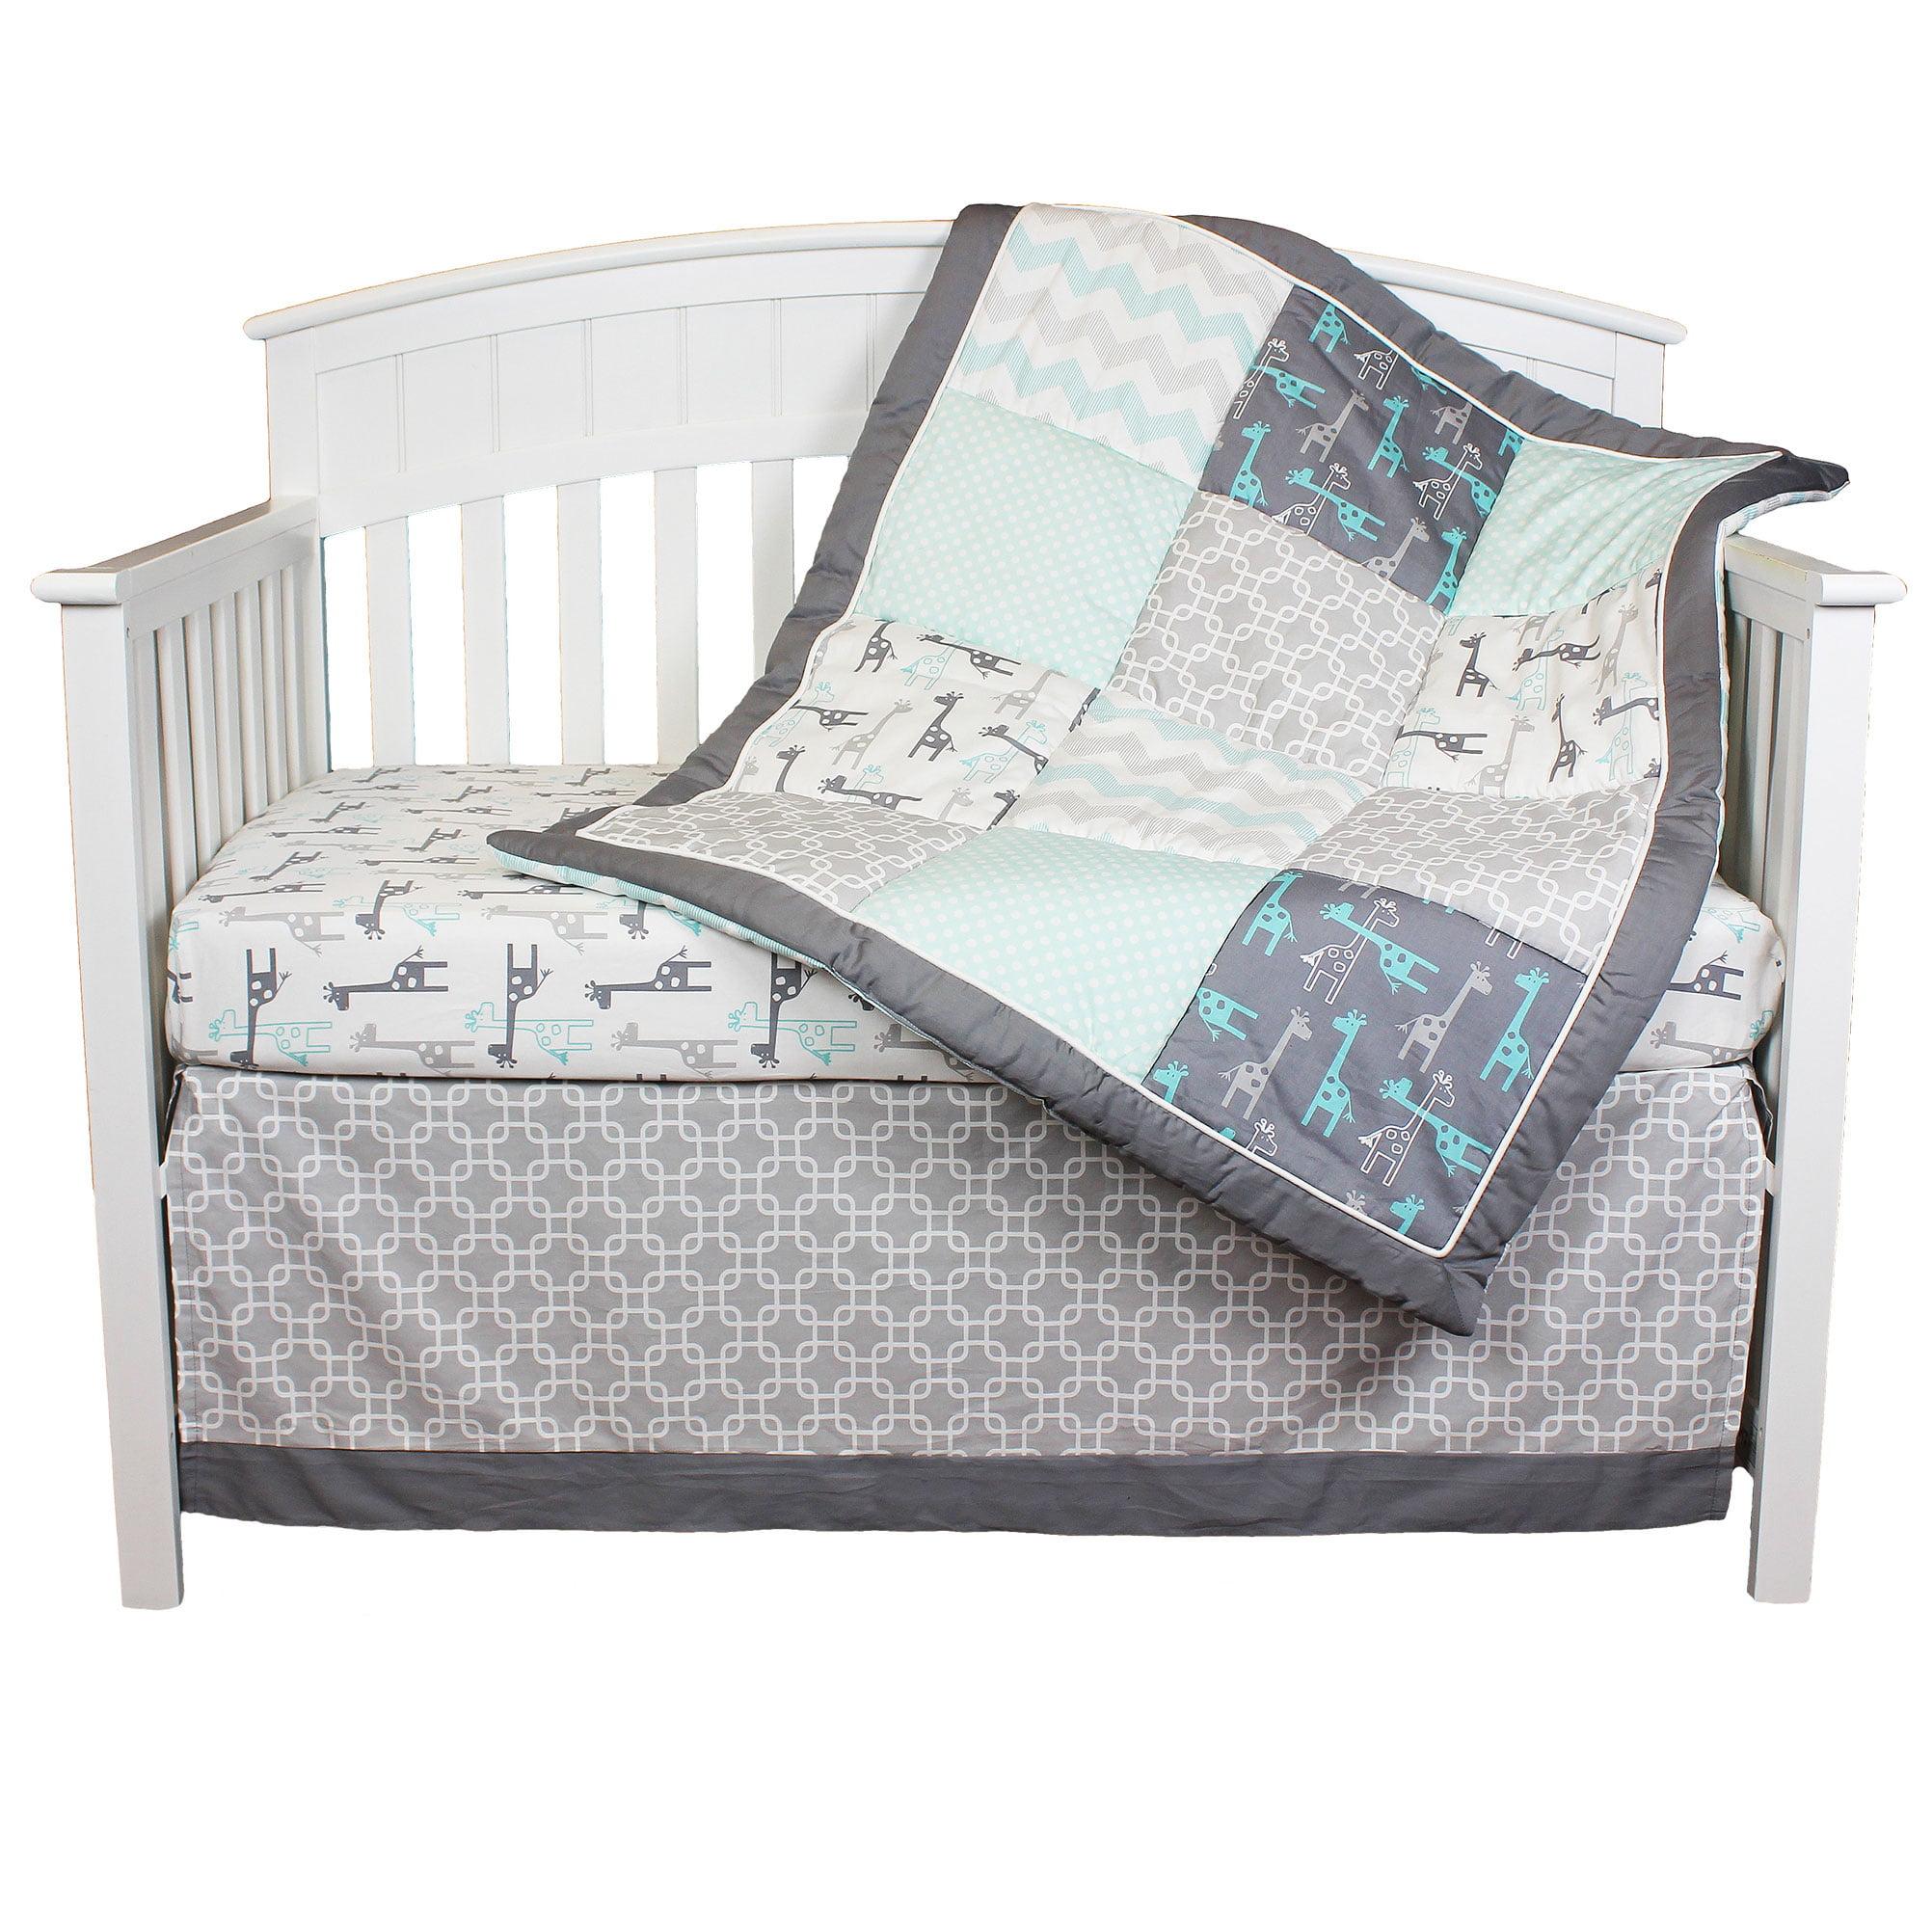 The Peanut Shell Crib Bedding Set Grey And Aqua Uptown Giraffe 4 Piece Baby Collection